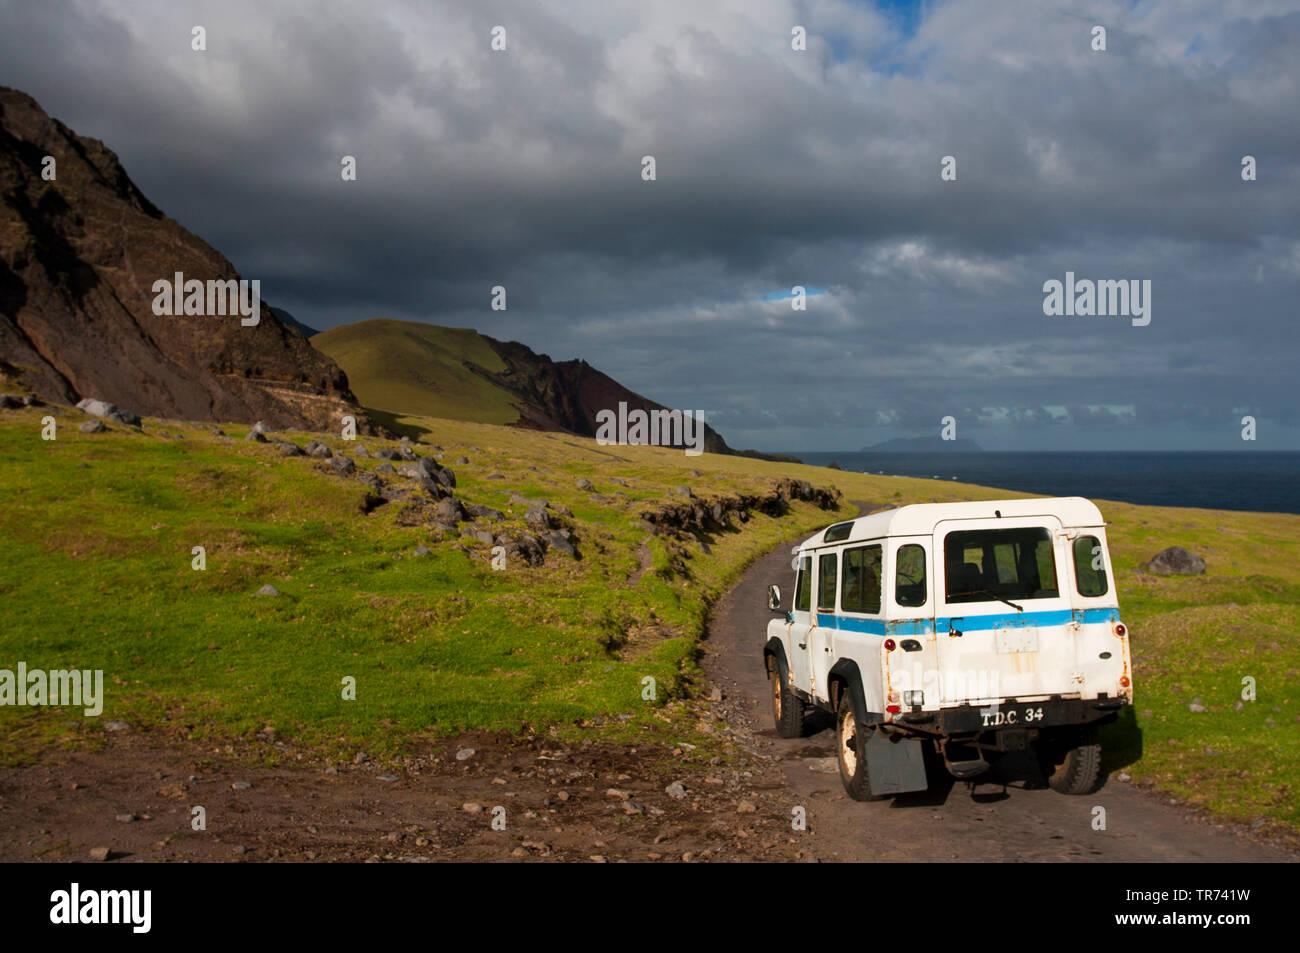 Landschaft auf Tristan da Cunha, Tristan da Cunha   landscape on Tristan da Cunha, Tristan da Cunha   BLWS497128.jpg [ (c) blickwinkel/AGAMI/M. Guyt T - Stock Image